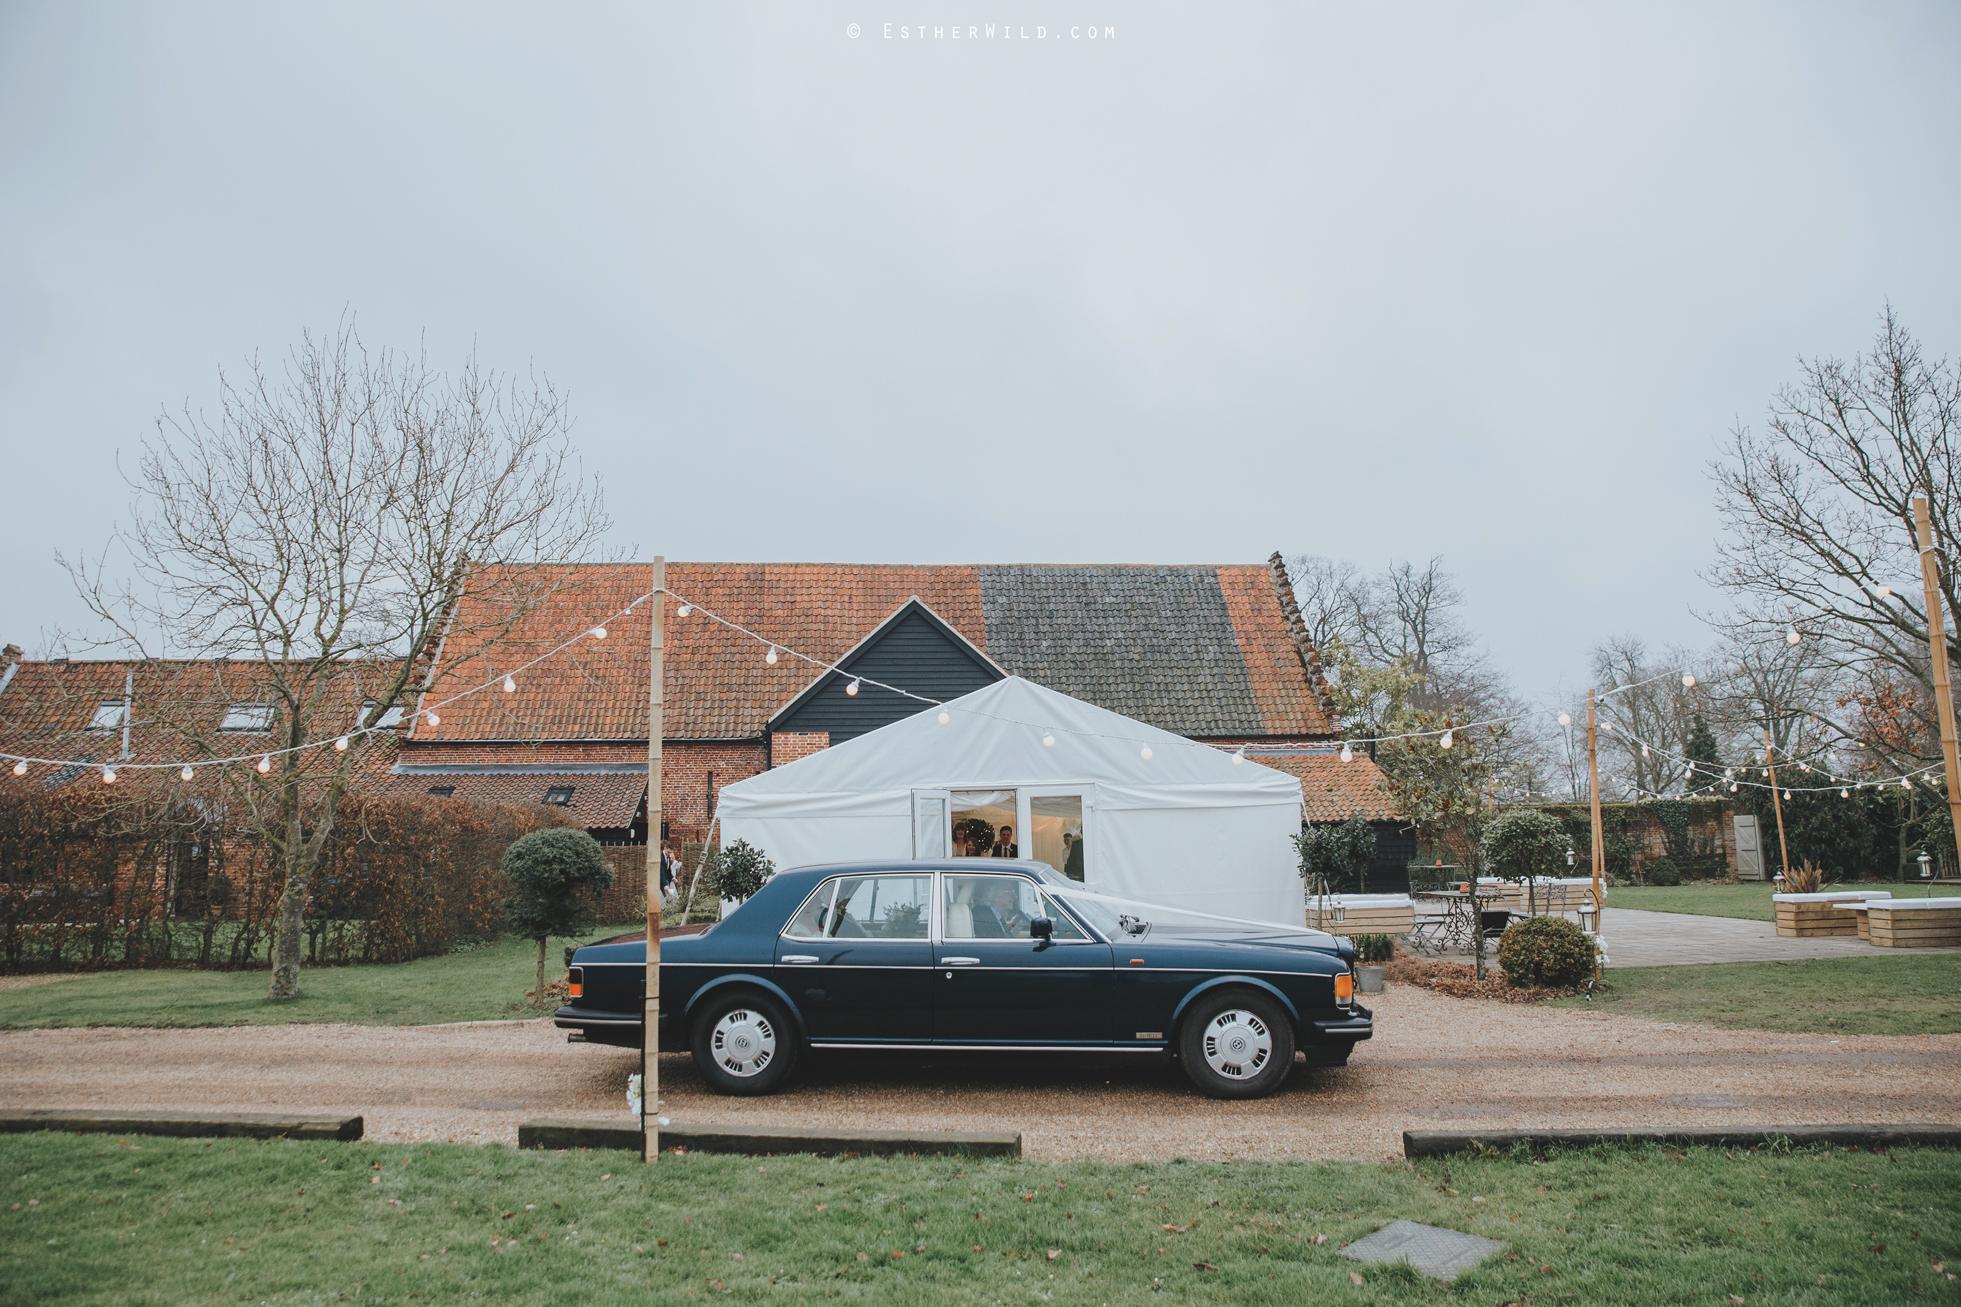 Elms_Barn_Weddings_Suffolk_Photographer_Copyright_Esther_Wild_IMG_1012.jpg